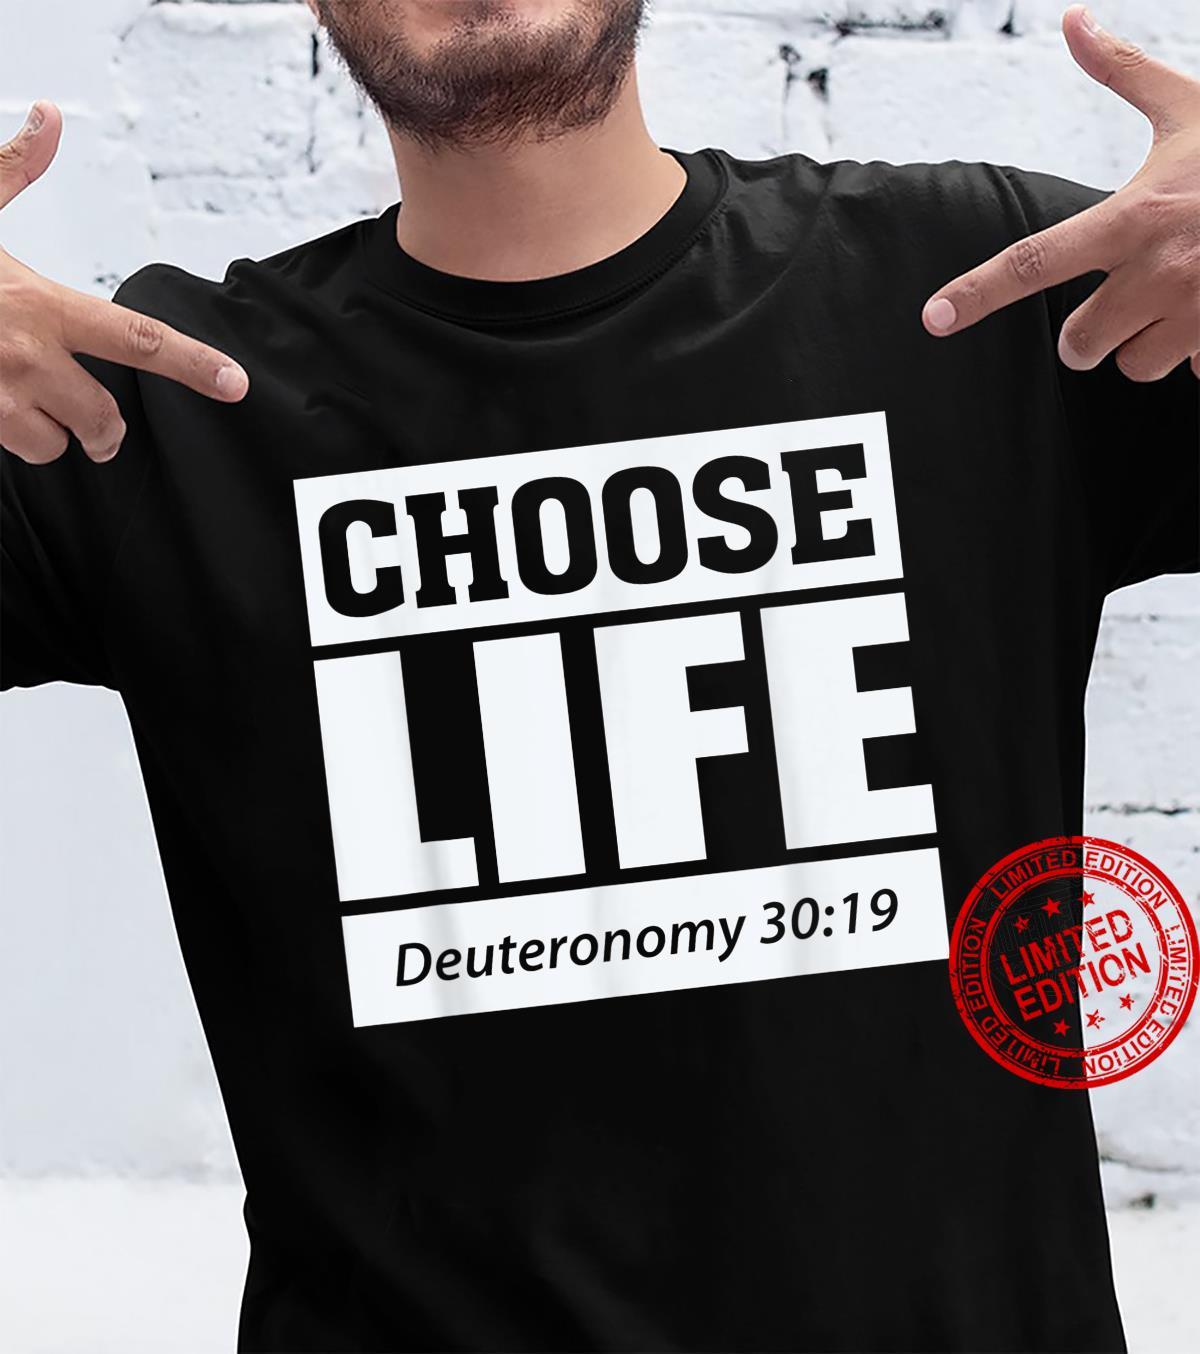 Choose Life Deuteronomy 3019 Christian Bible Verse Shirt